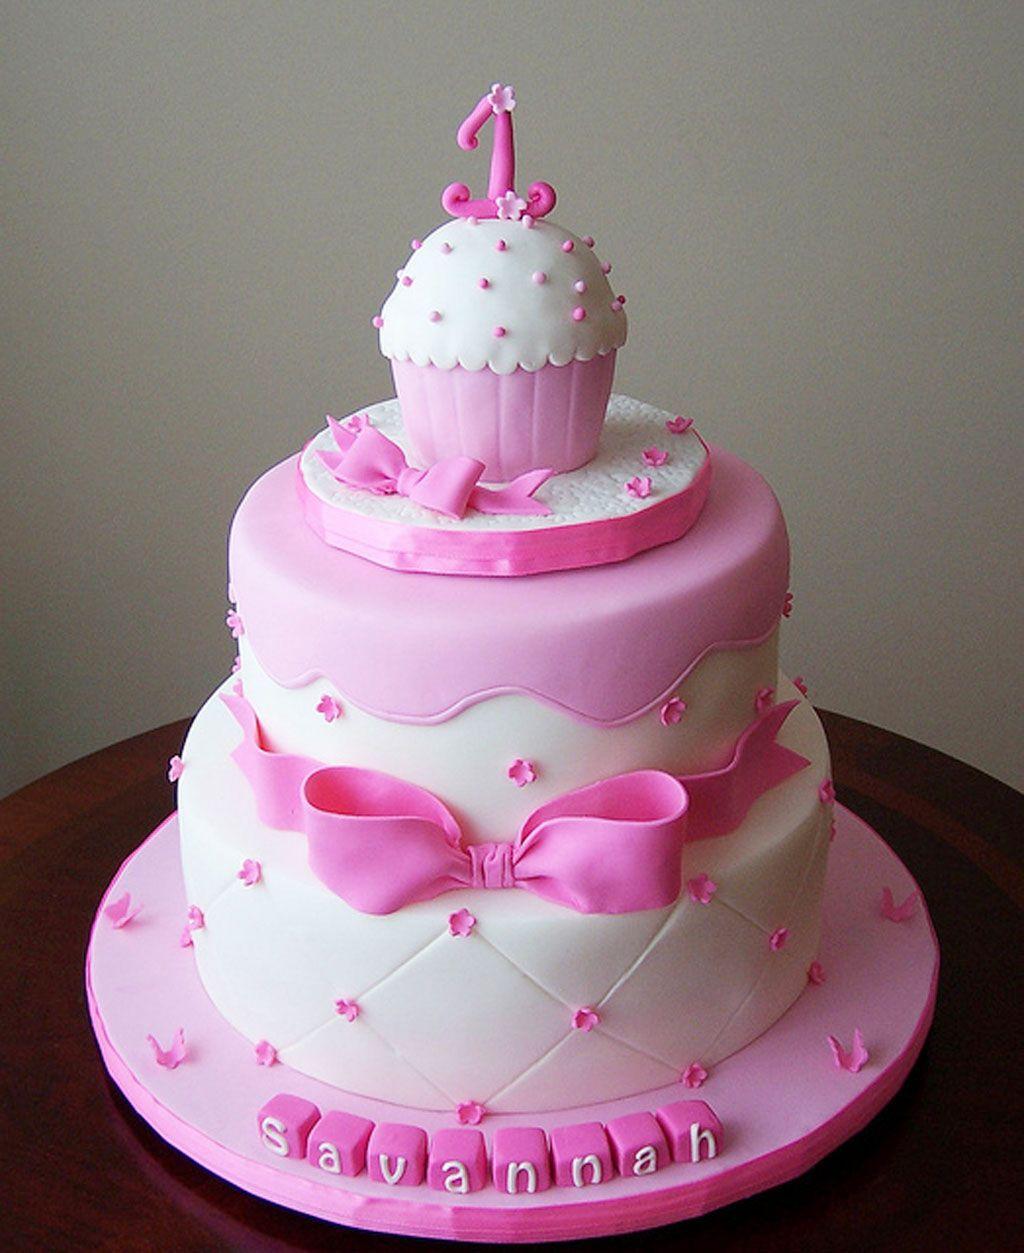 Birthday Cake Gorgeous Cakes Birthday Cake Girls 1st Birthday